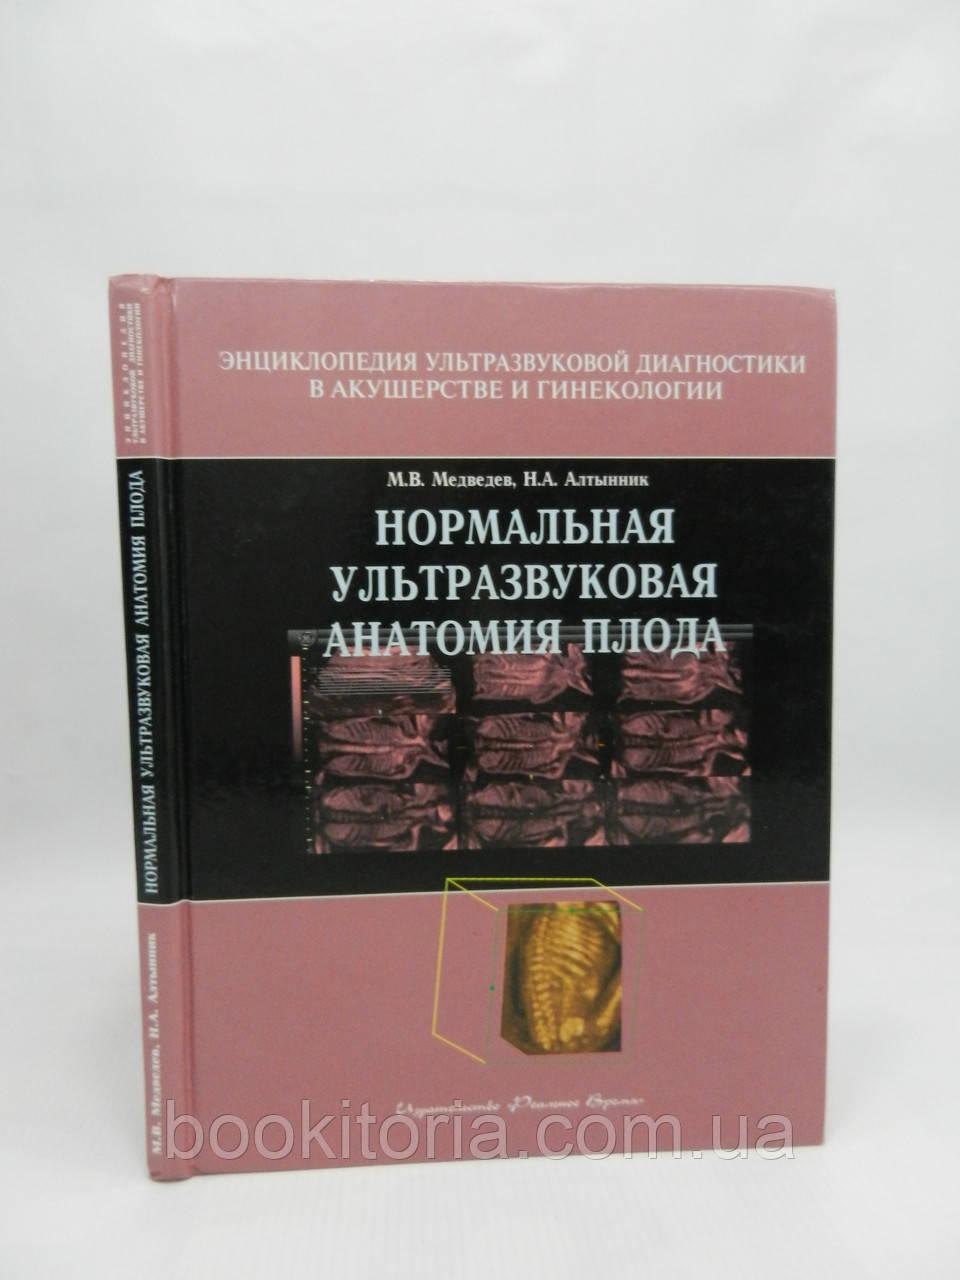 Медведев М., Алтынник Н. Нормальная ультразвуковая анатомия плода (б/у).